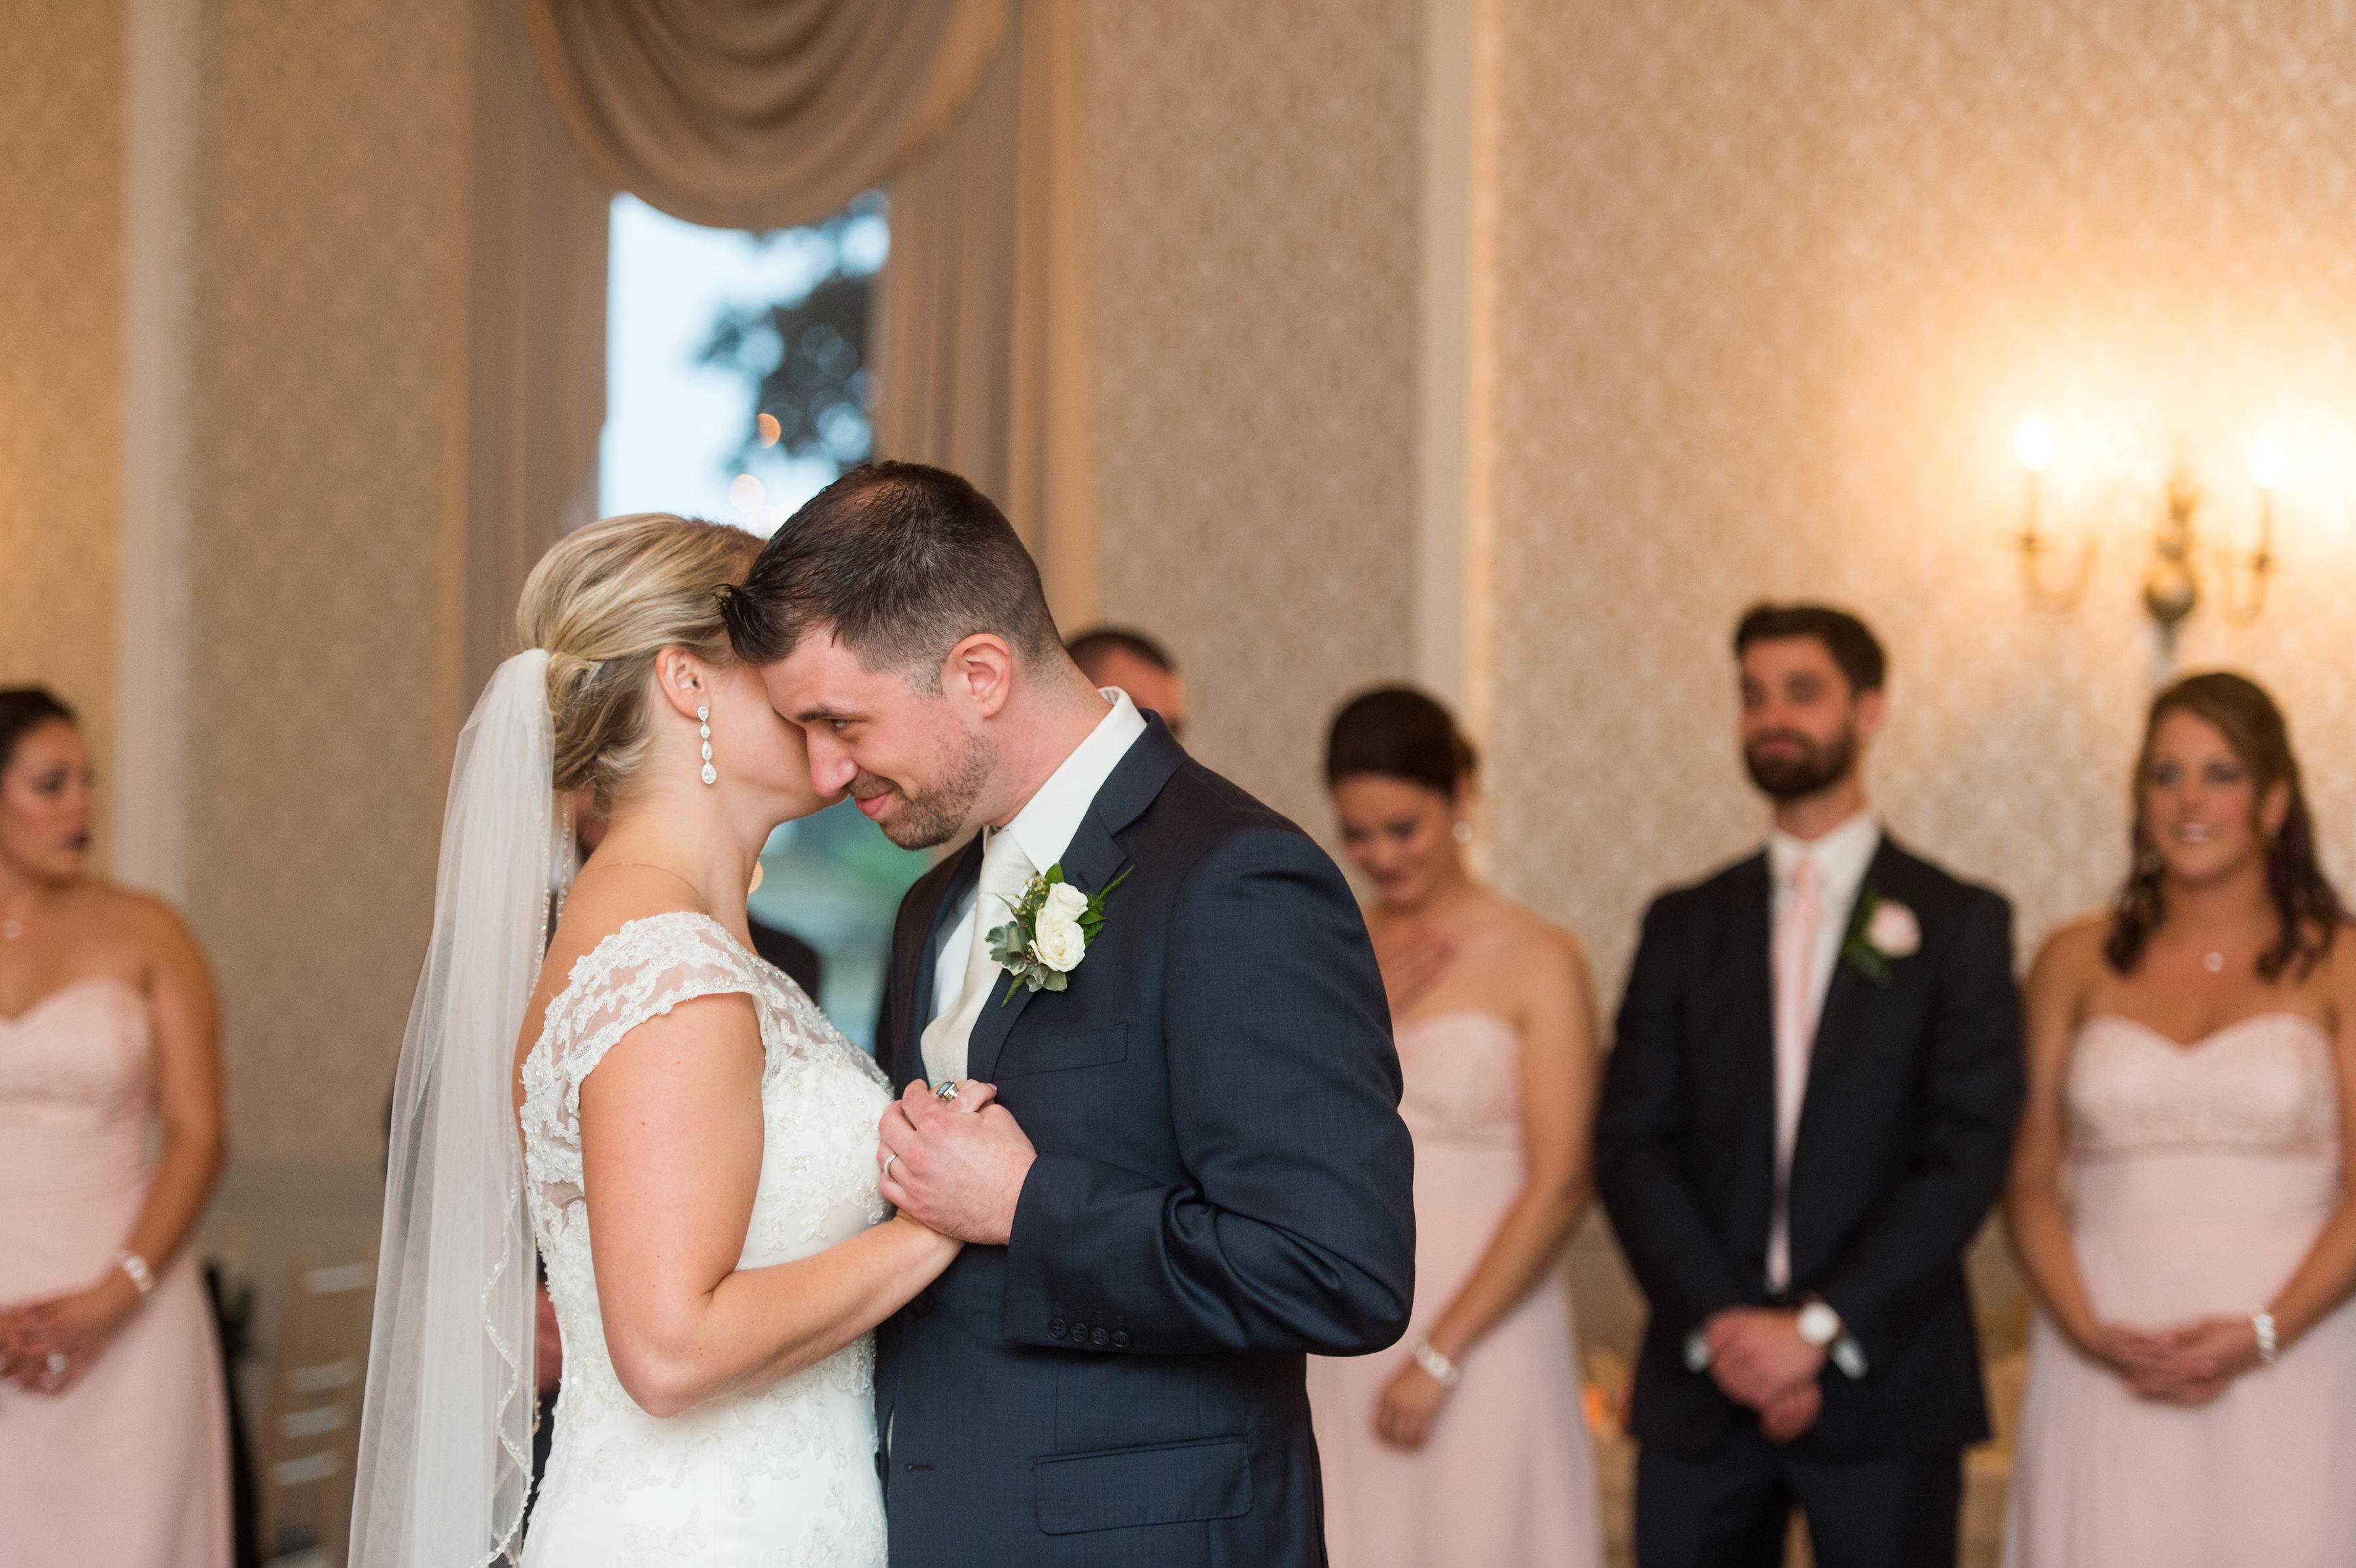 allegra_anderson_photography_ct_wedding_photographer_farmington_club_699